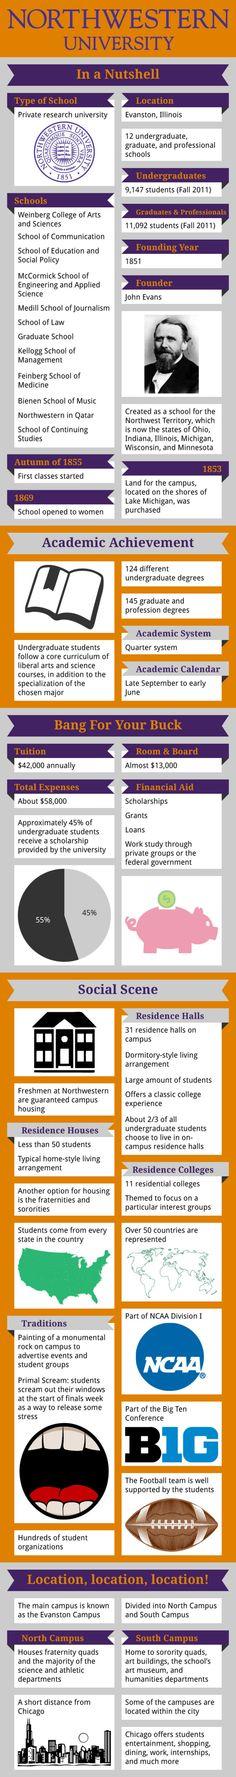 Northwestern University Infographic